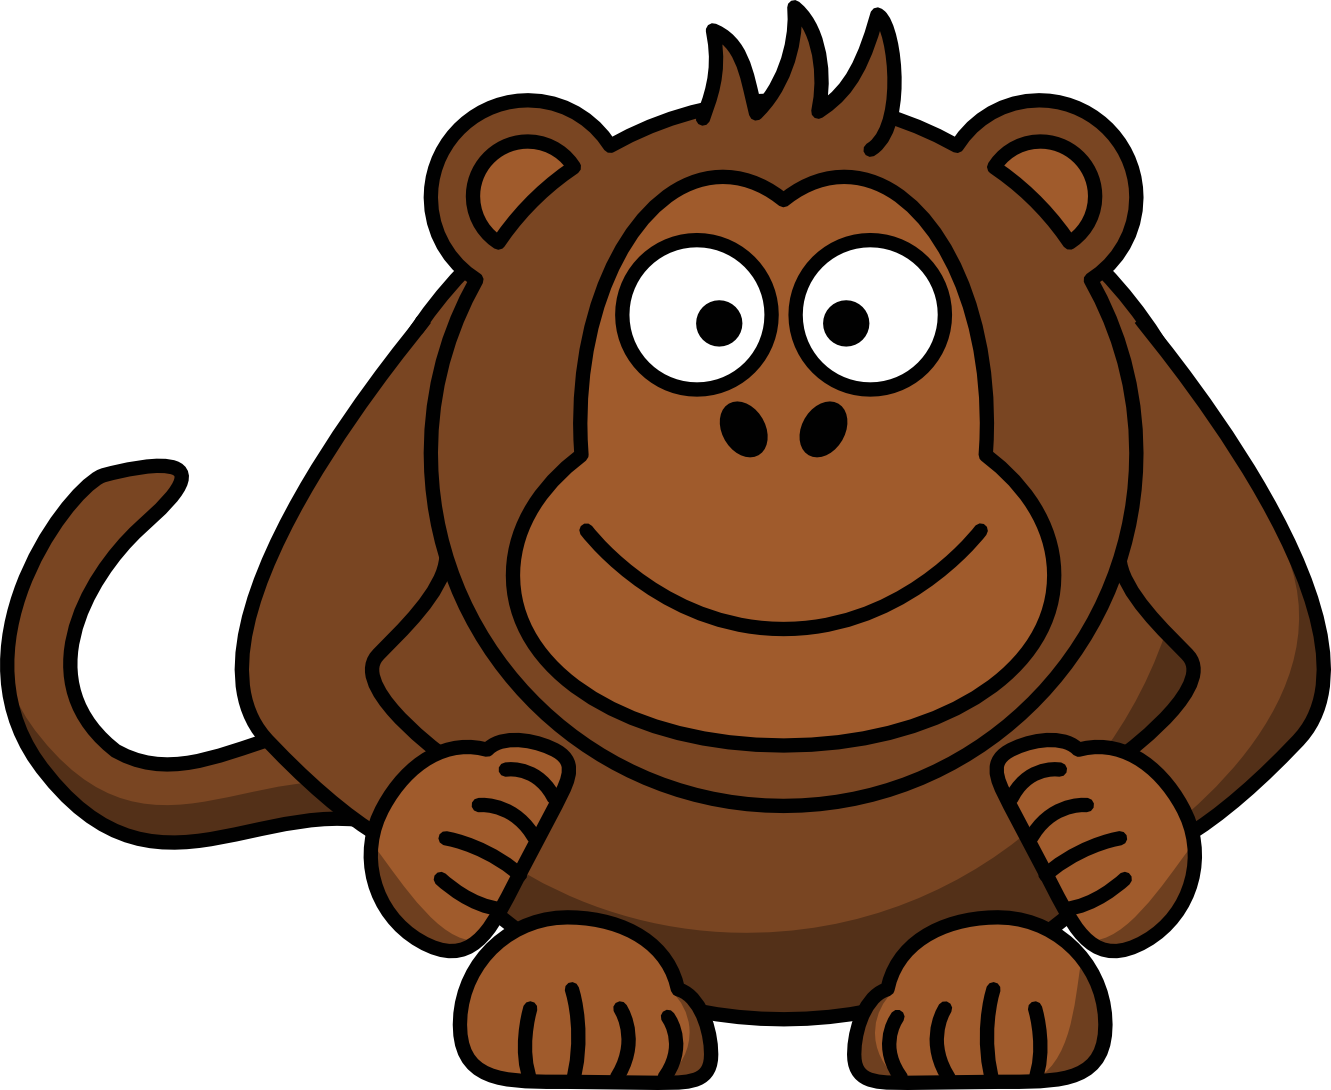 jpg transparent Monkey Cartoon